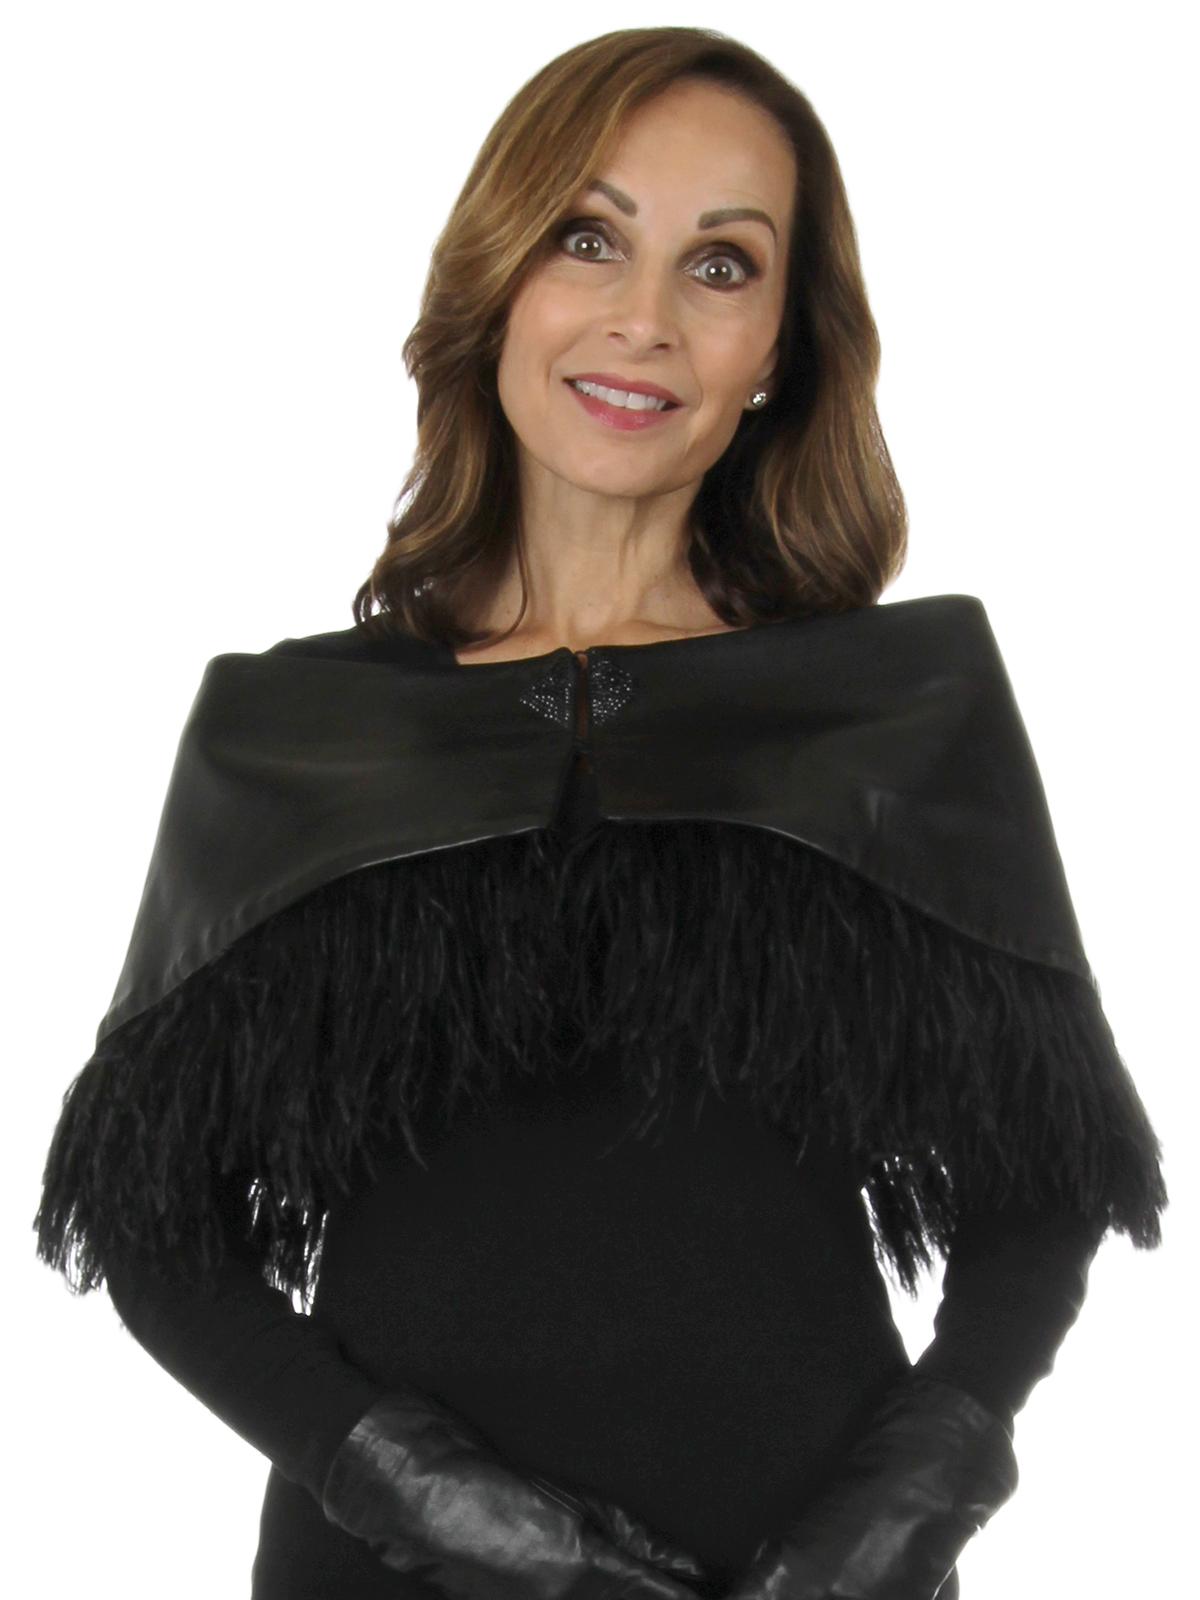 Woman's New Carolyn Rowan Black Robie Leather Stole